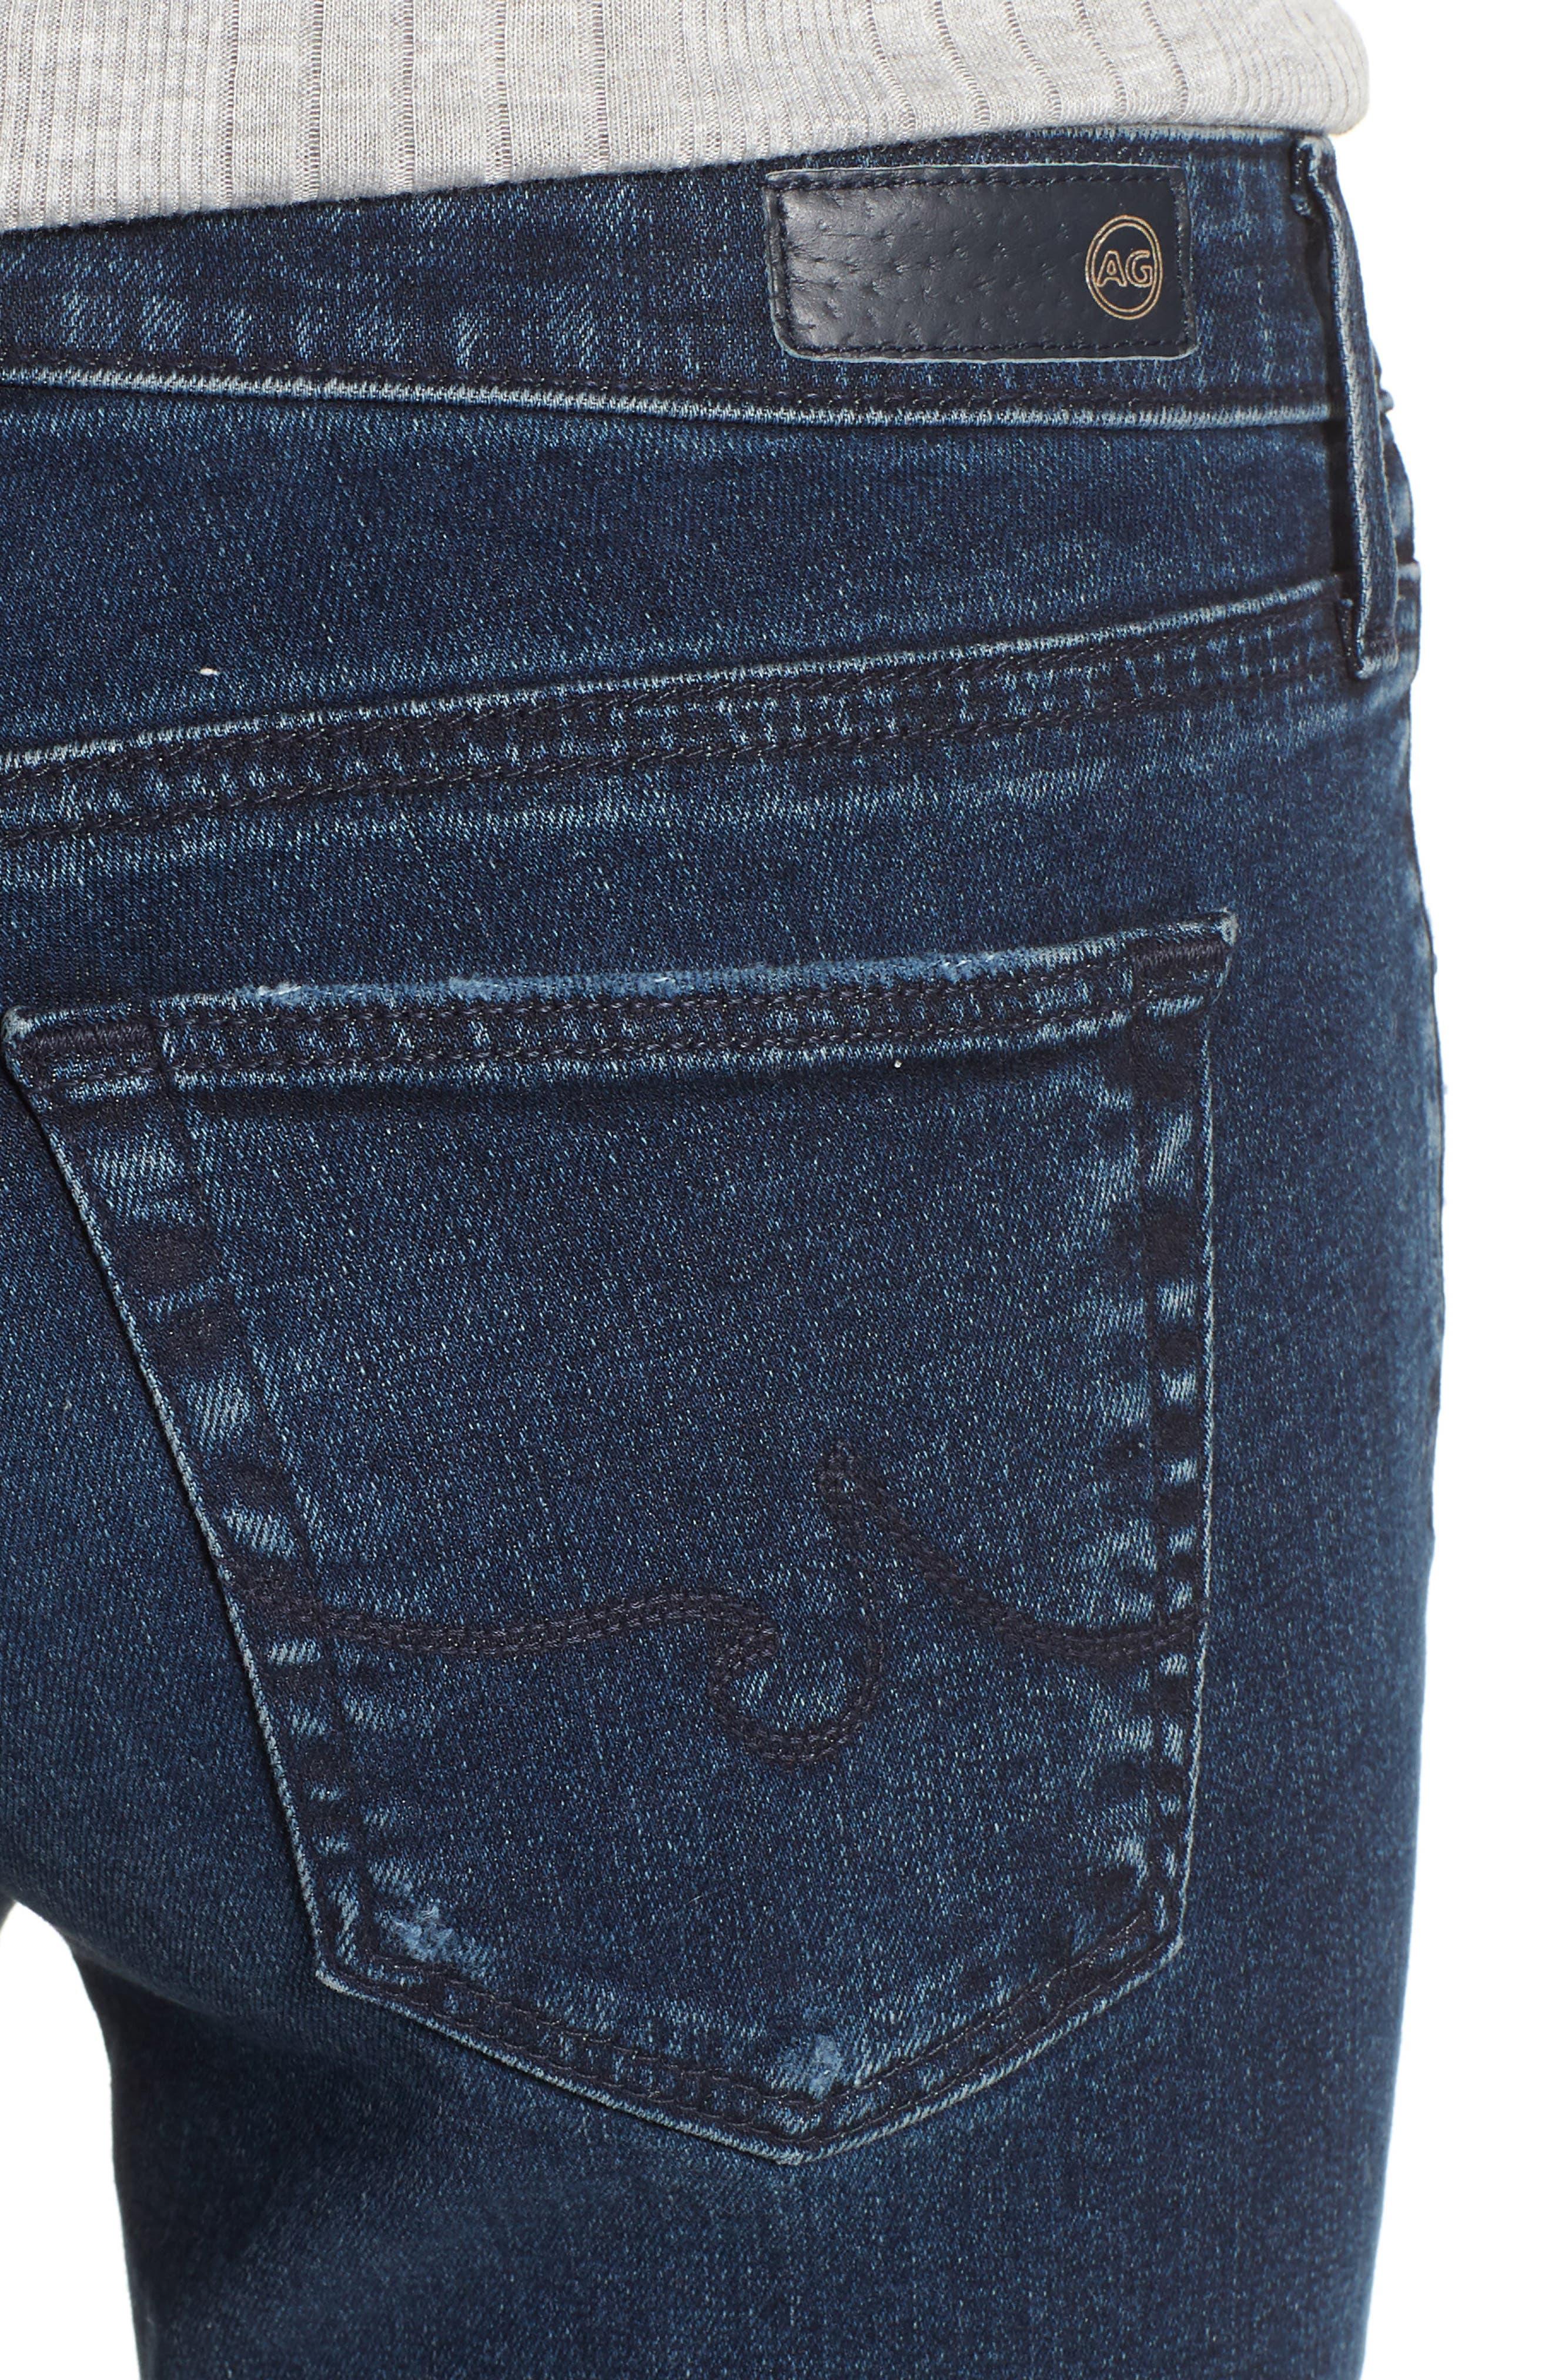 The Legging Ankle Super Skinny Jeans,                             Alternate thumbnail 4, color,                             ETHEREAL